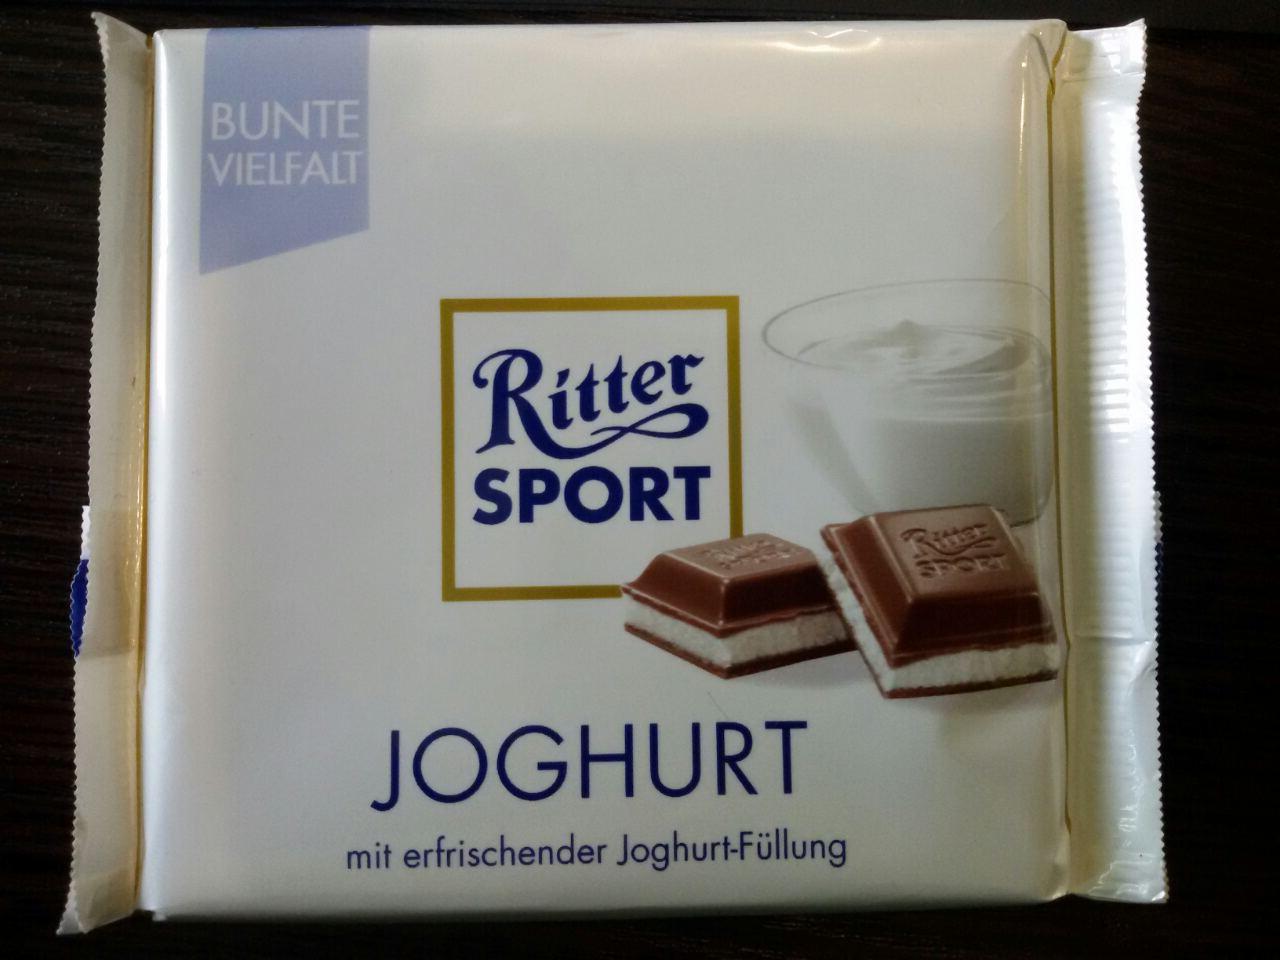 Шоколад Ritter sport йогурт (Ритер спорт) 100г. Германия